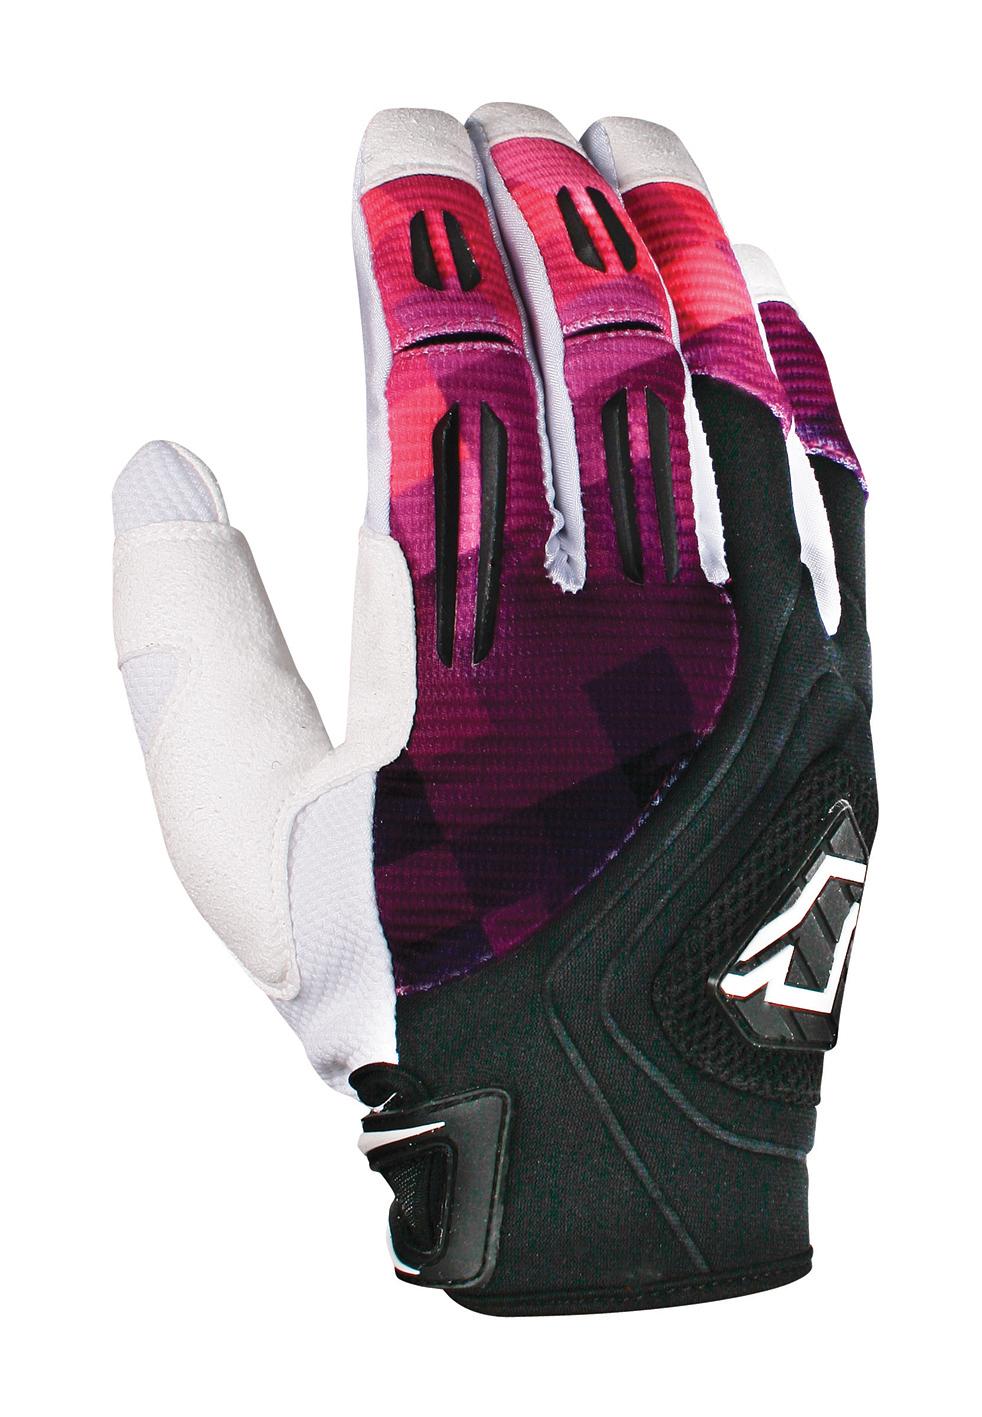 Yoko motorcycle gloves - Yoko Motorcycle Gloves 48